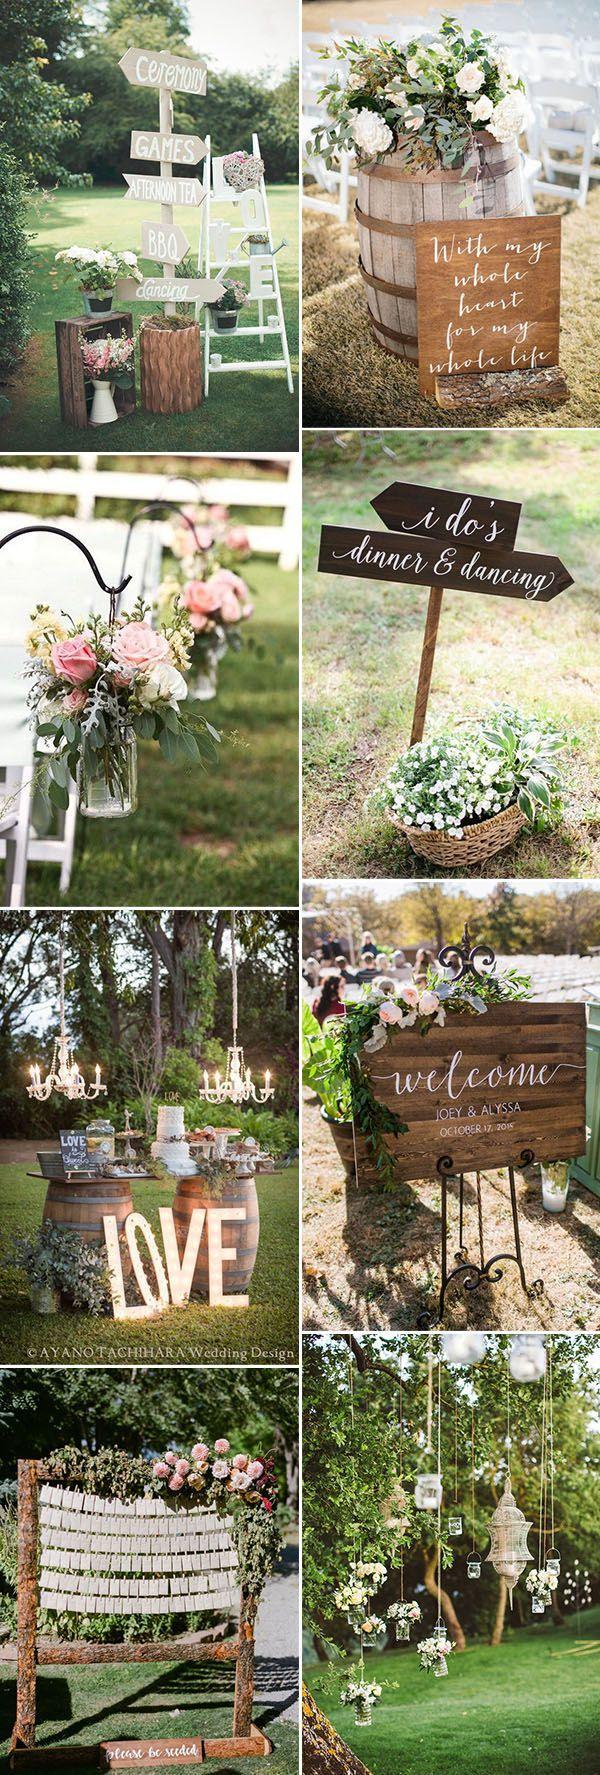 6 Most Inspiring Garden-Inspired Wedding Ideas